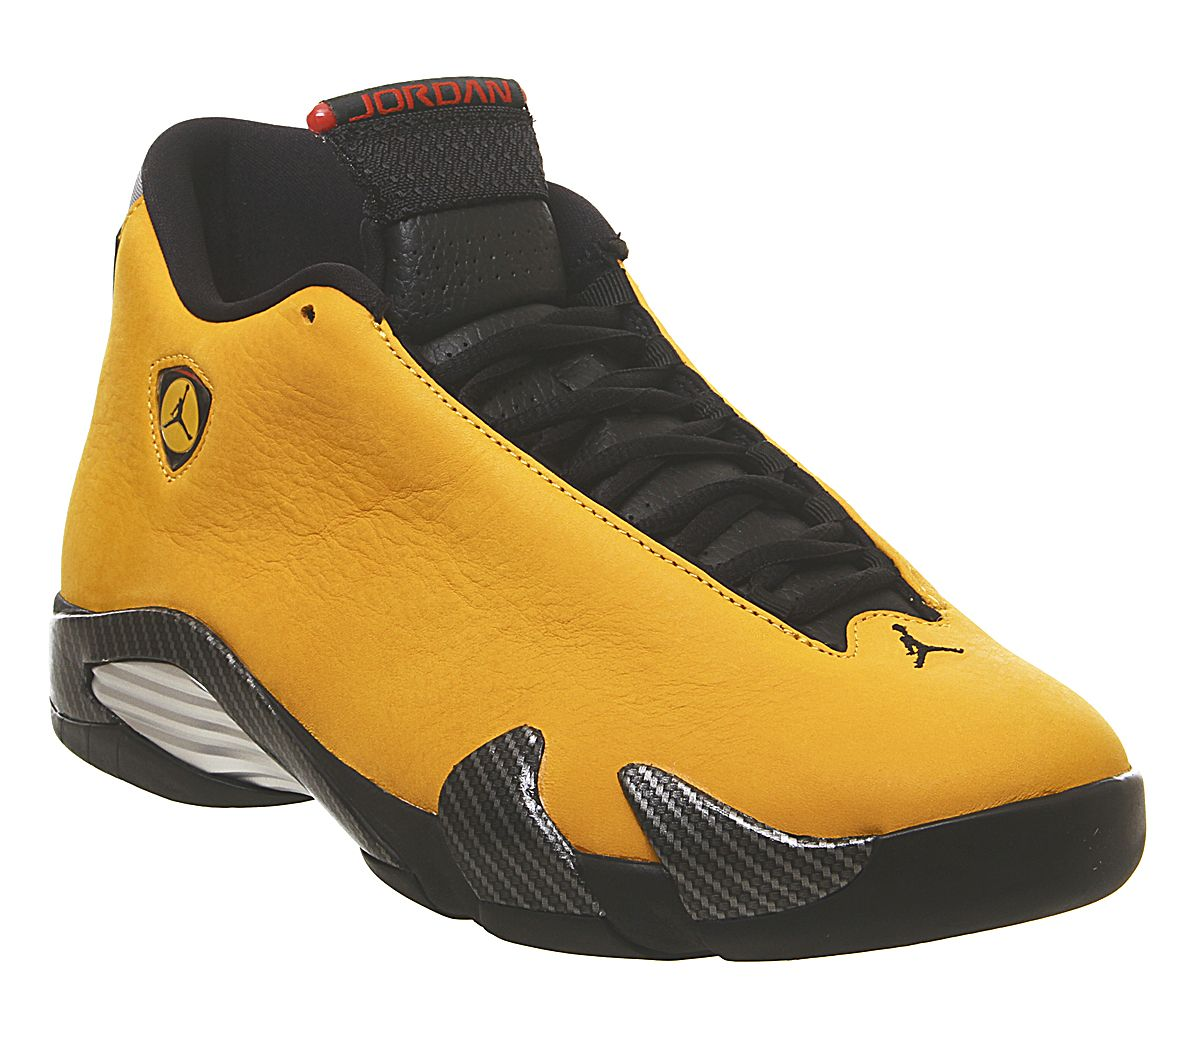 online retailer 7ef6a 275b6 Jordan Air Jordan 14 Retro University Gold Black University ...